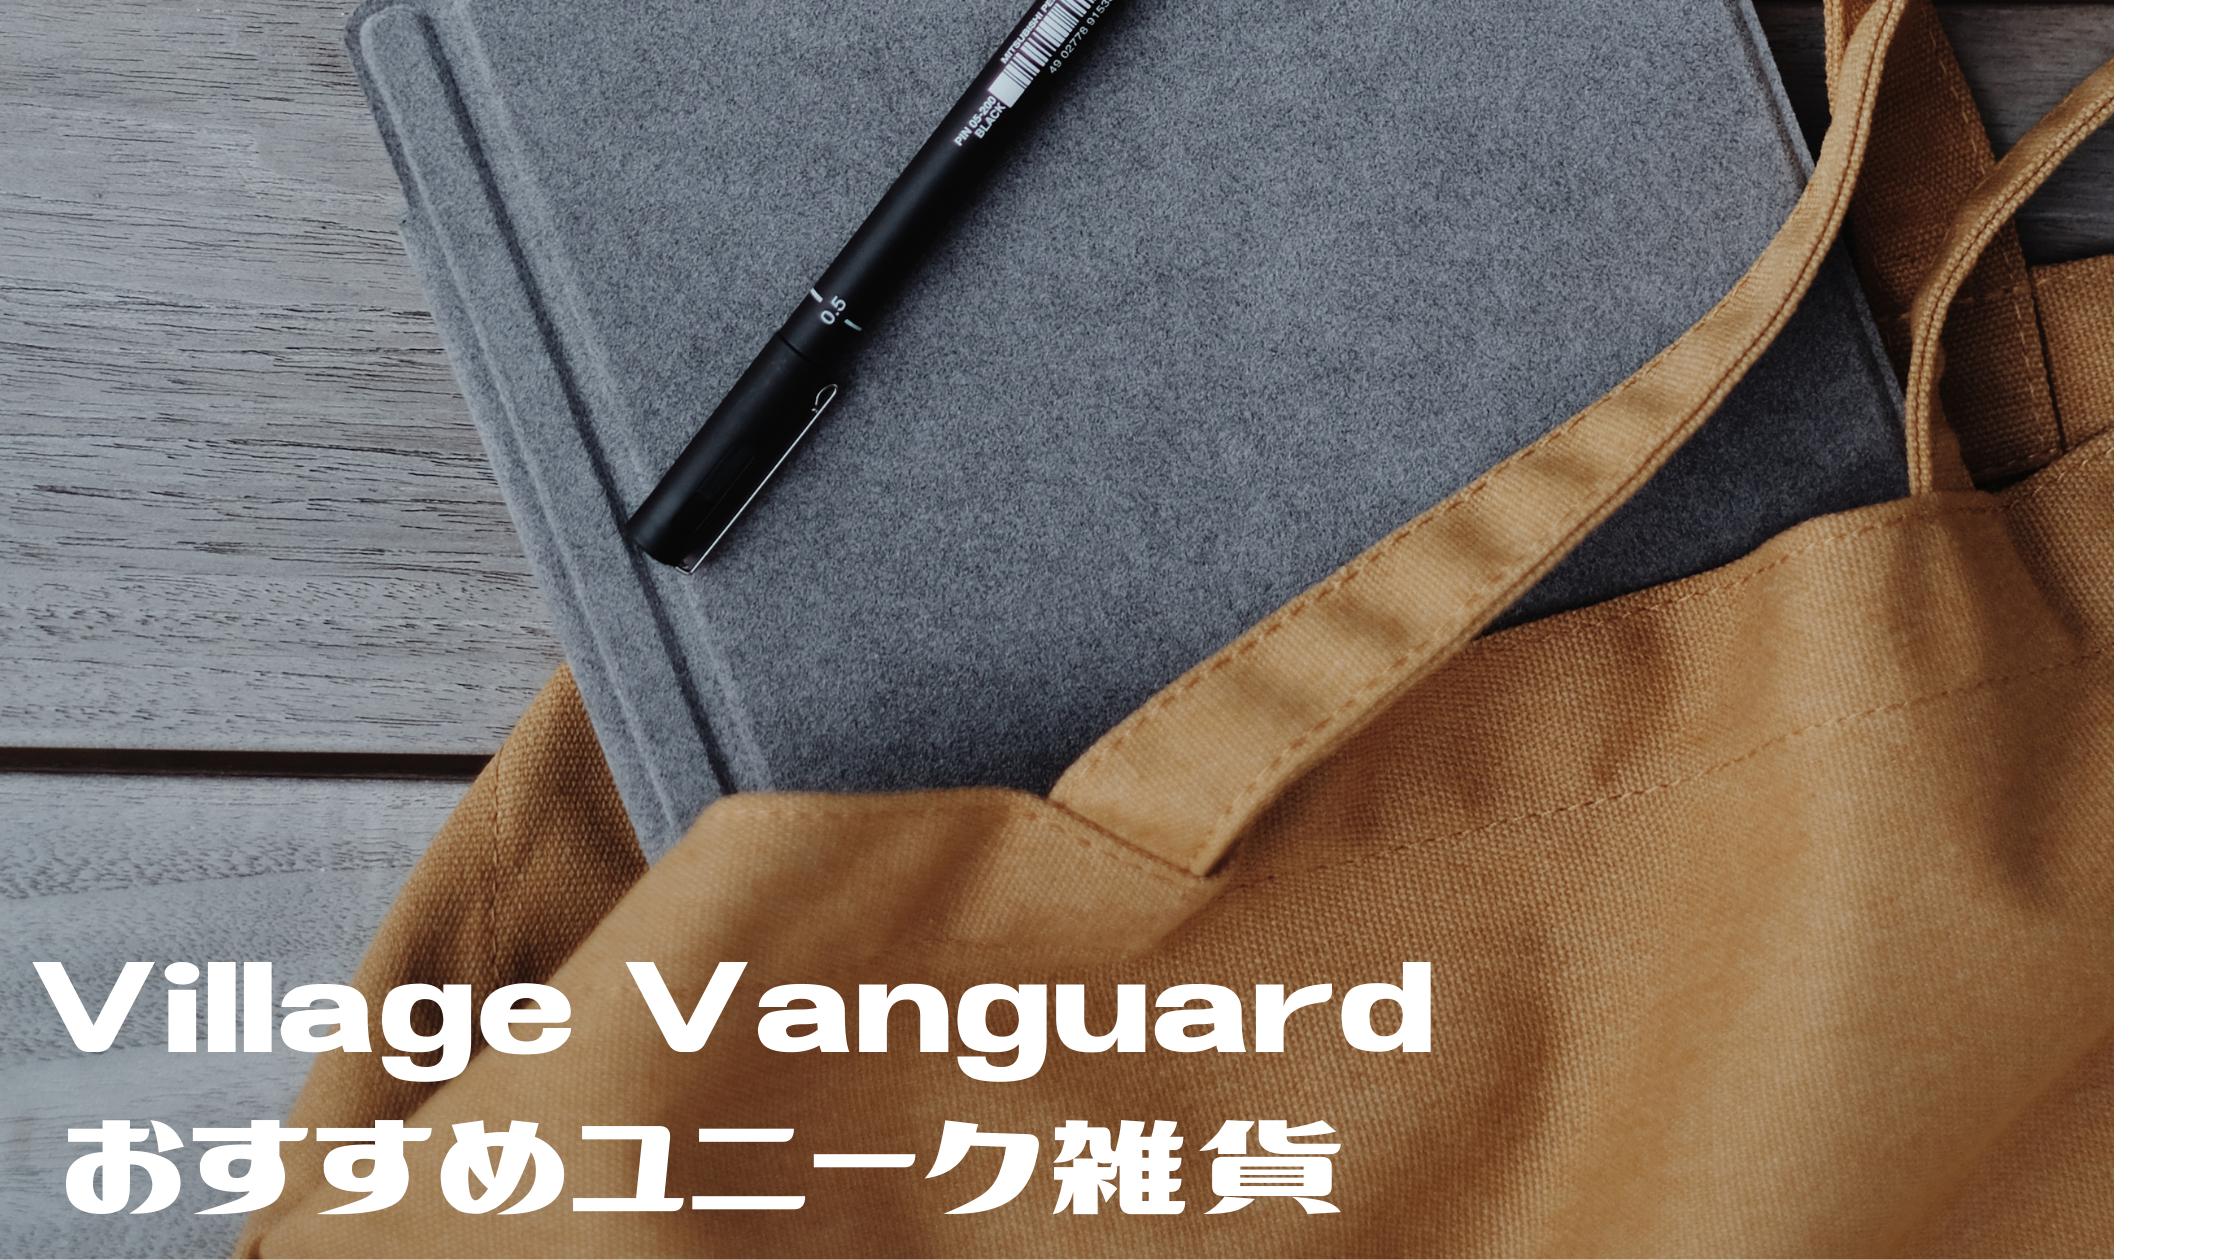 【Village Vanguard】おもしろ雑貨ヴィレヴァンのおすすめアイテム『広辞苑アイテム』『岩波書店アイテム』『ゆる袴』